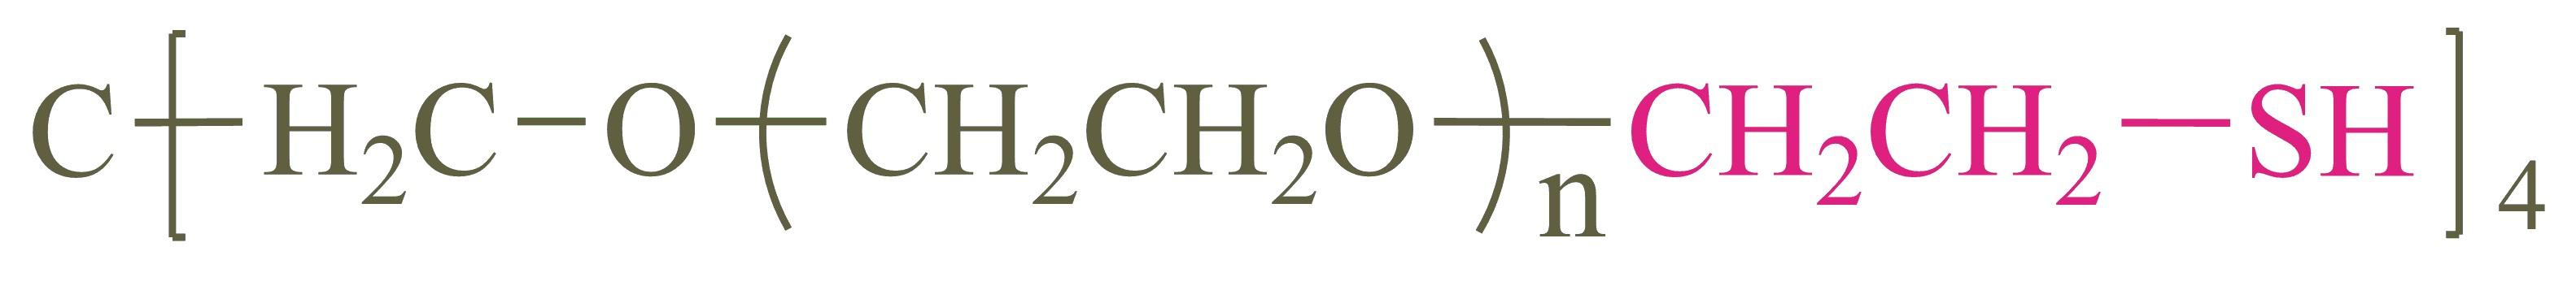 四臂聚乙二醇硫醇(4-arm PEG-SH);4-arm Poly(ethylene glycol) thiol